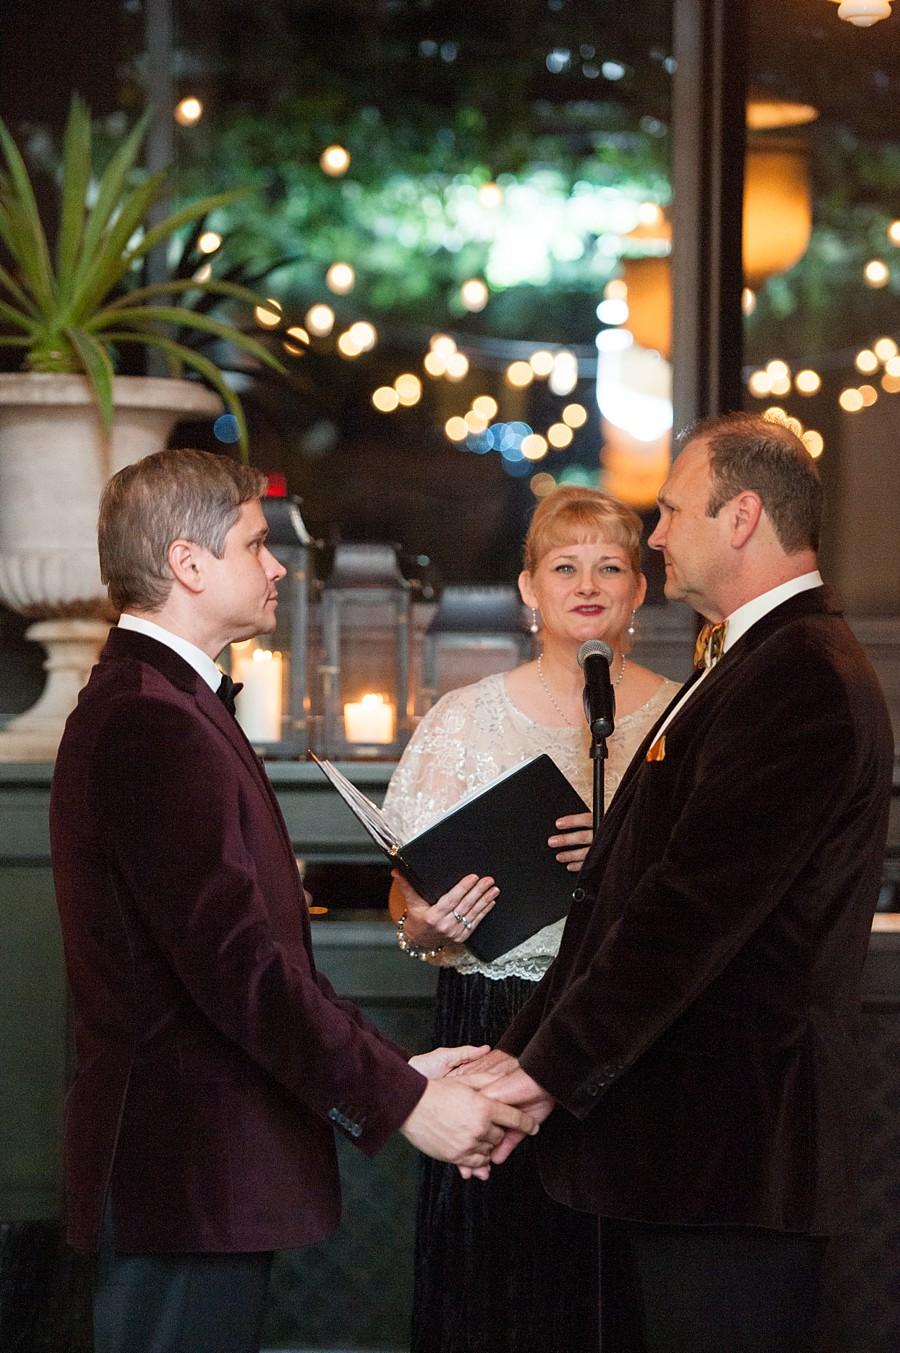 Gramercy_Park_Hotel_Wedding_NYC_FS_25.jpg